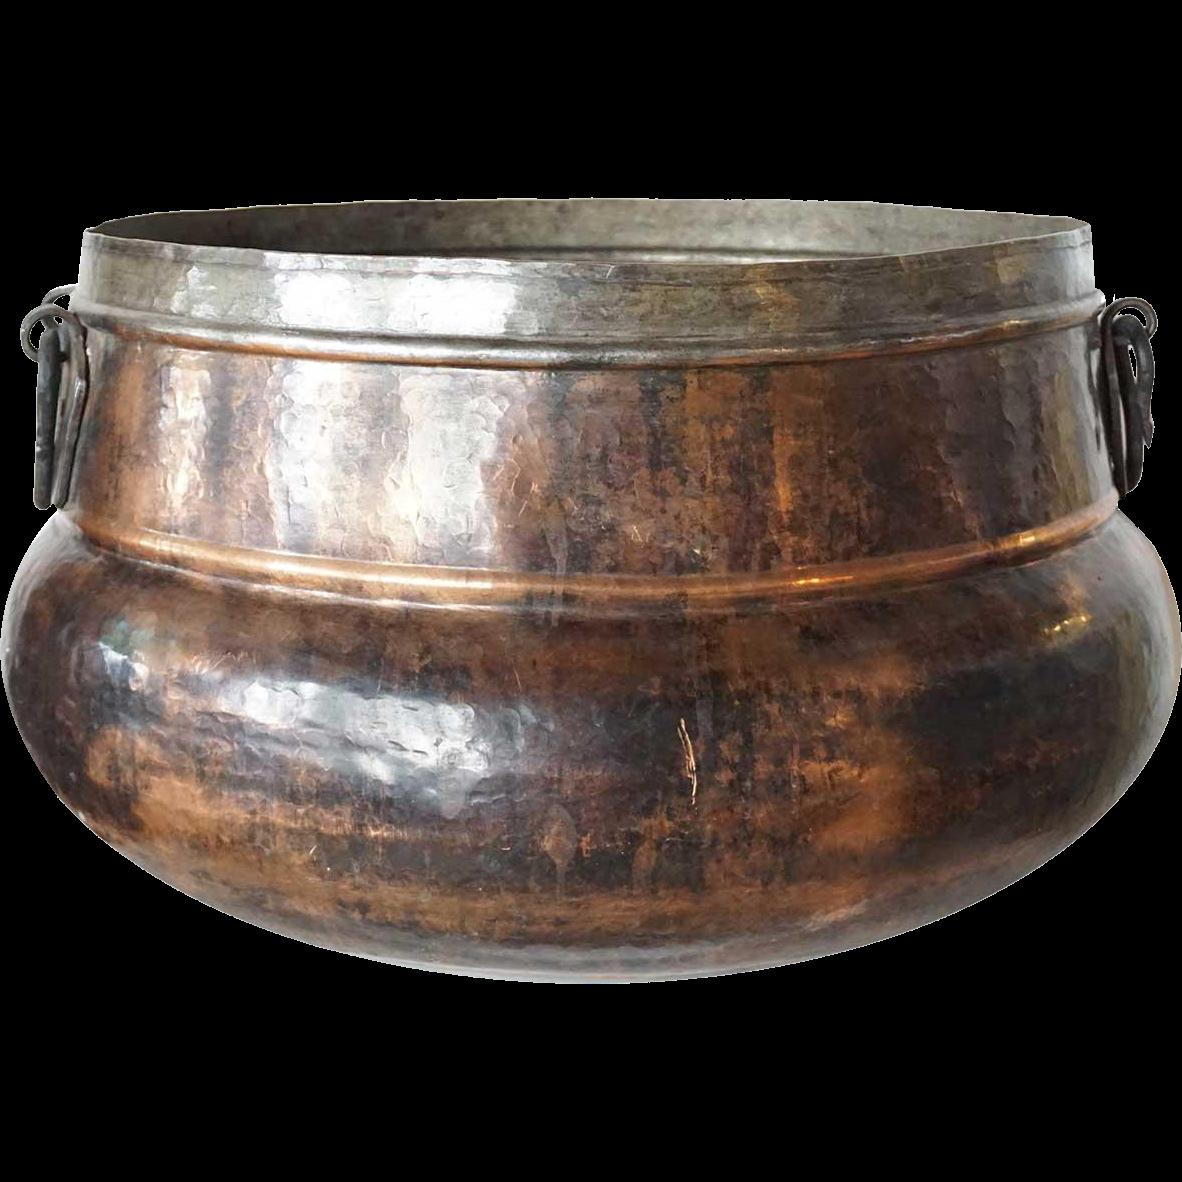 Mediterranean Hammered Copper and Iron Vessel